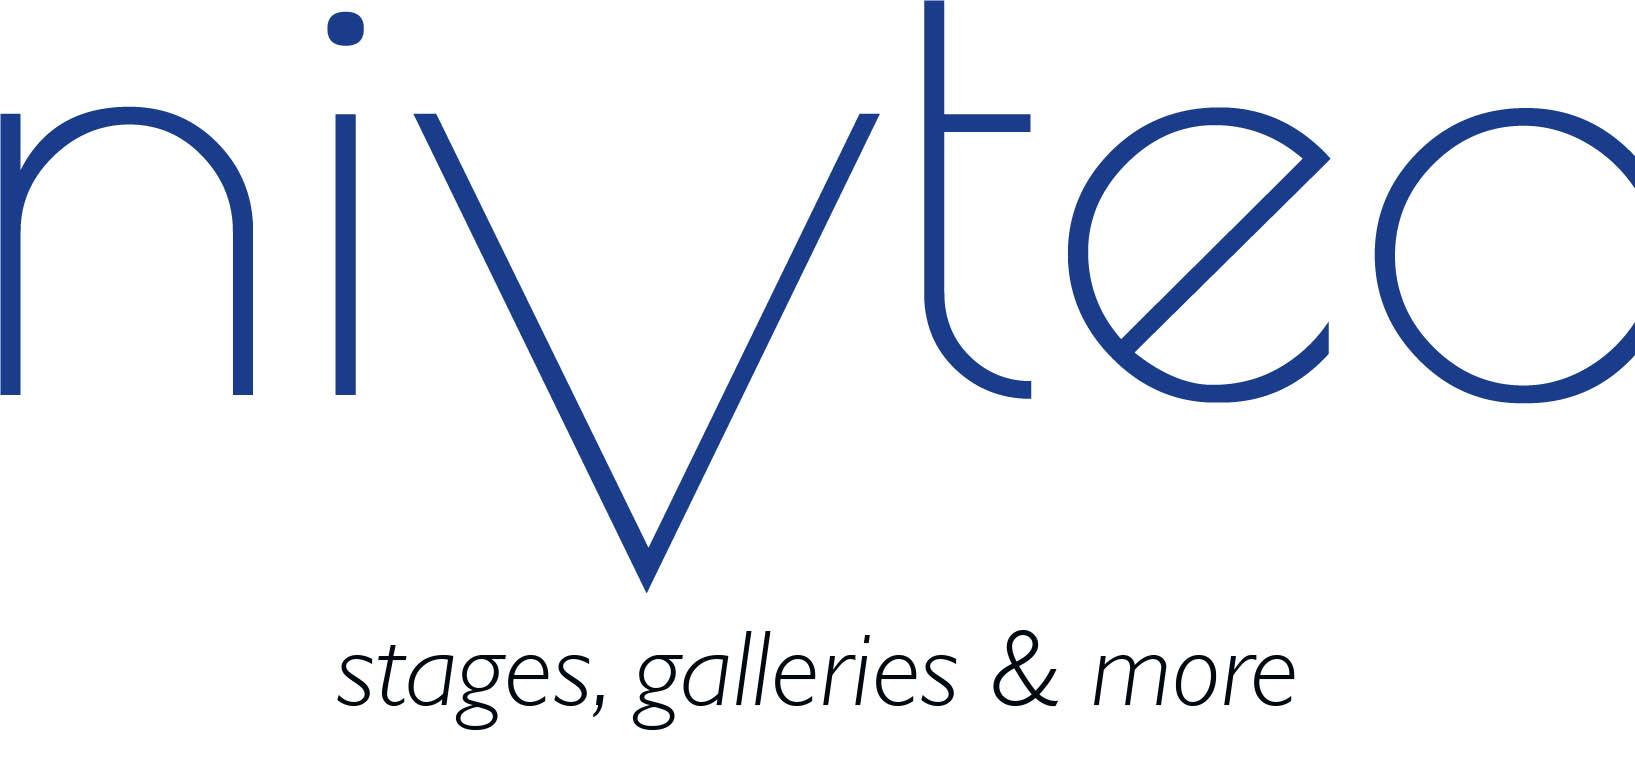 nivtec logo 2